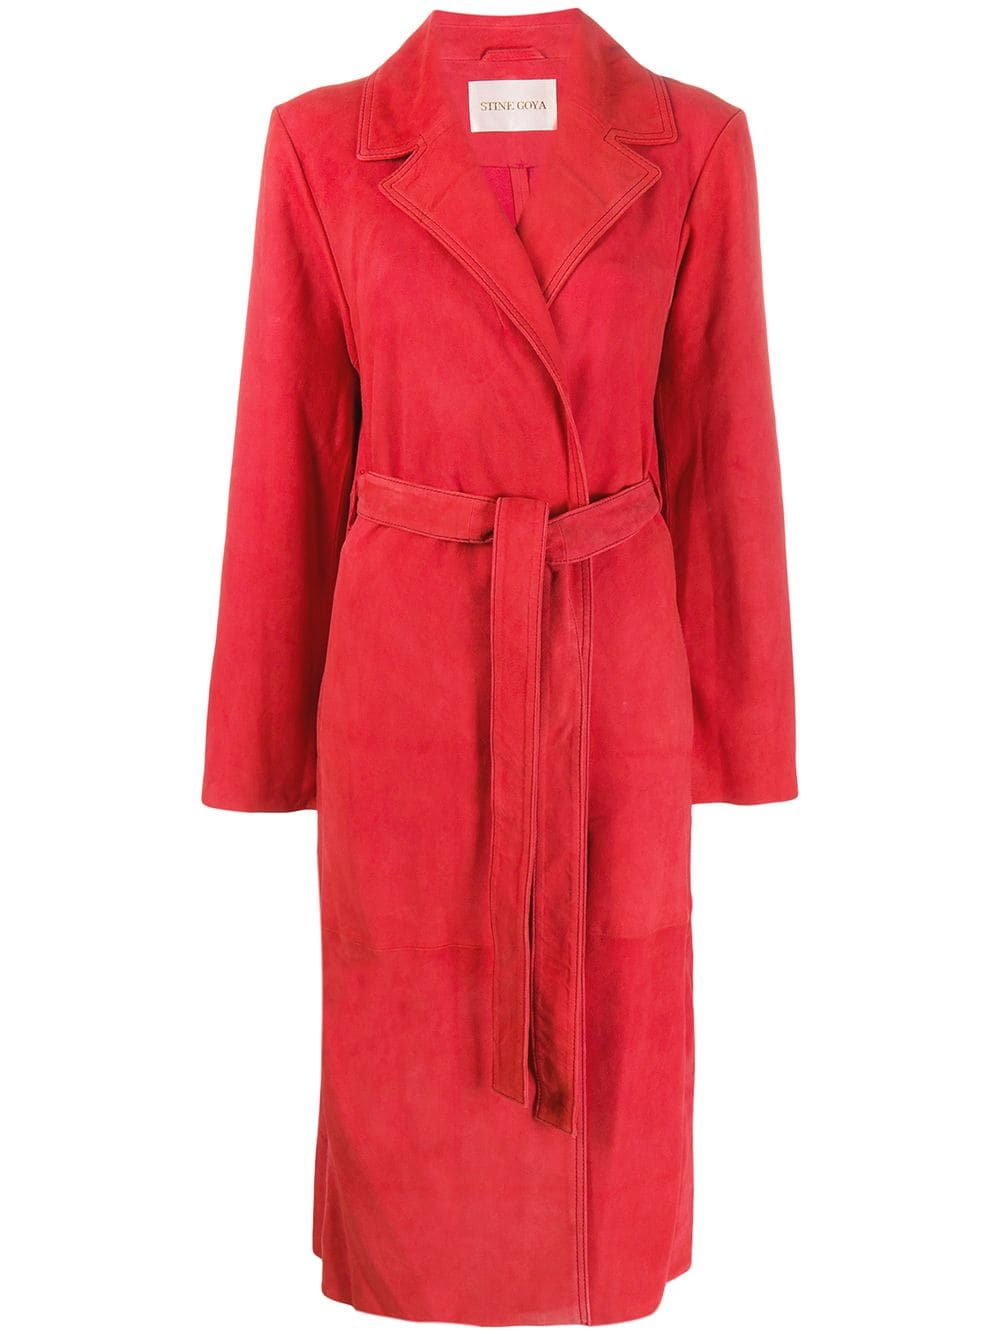 Stine Goya   тренч с поясом   Clouty